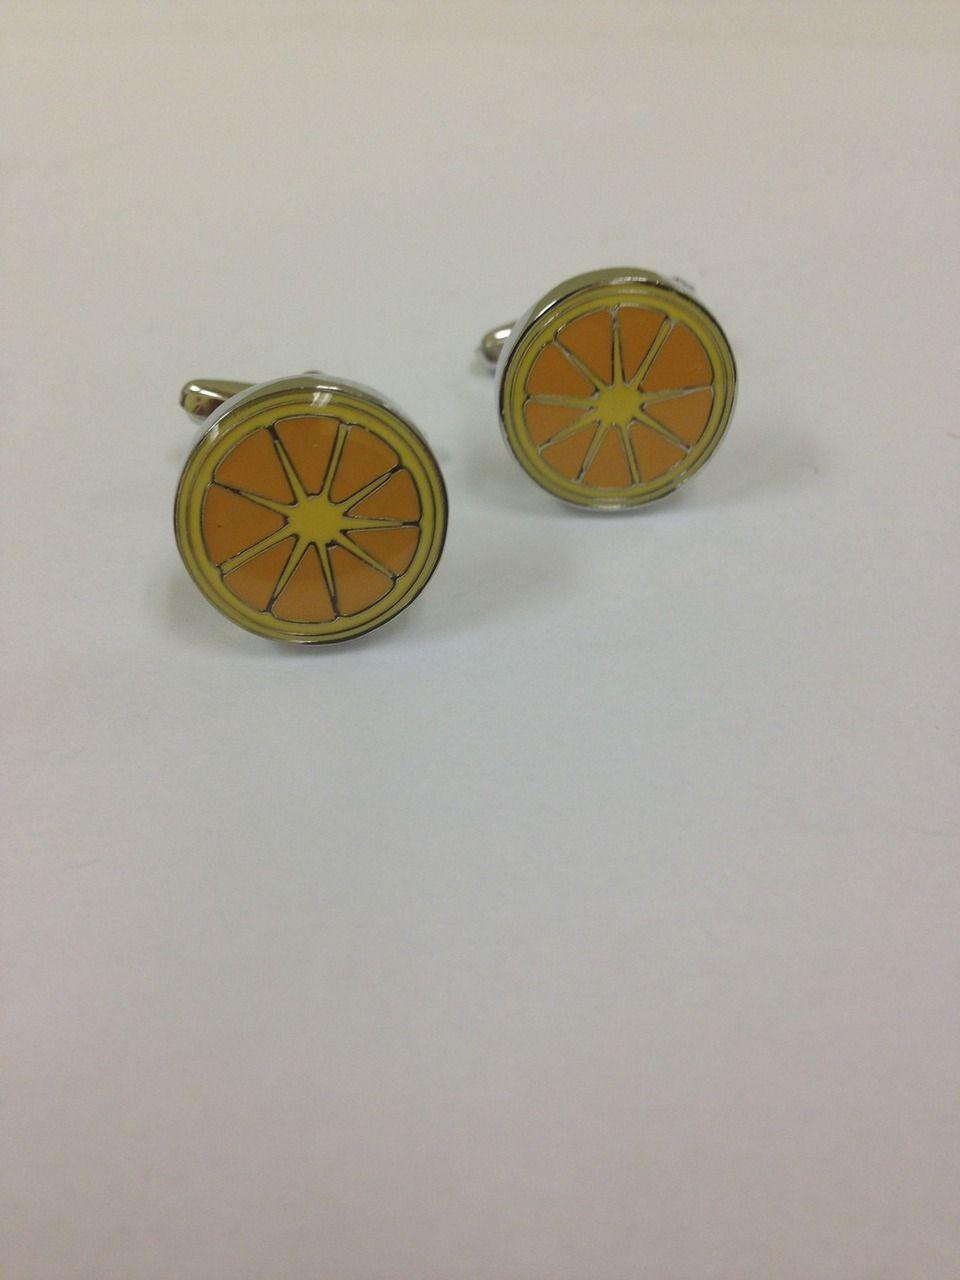 2 Pc. Circle Orange Tangerine Piece Cufflinks